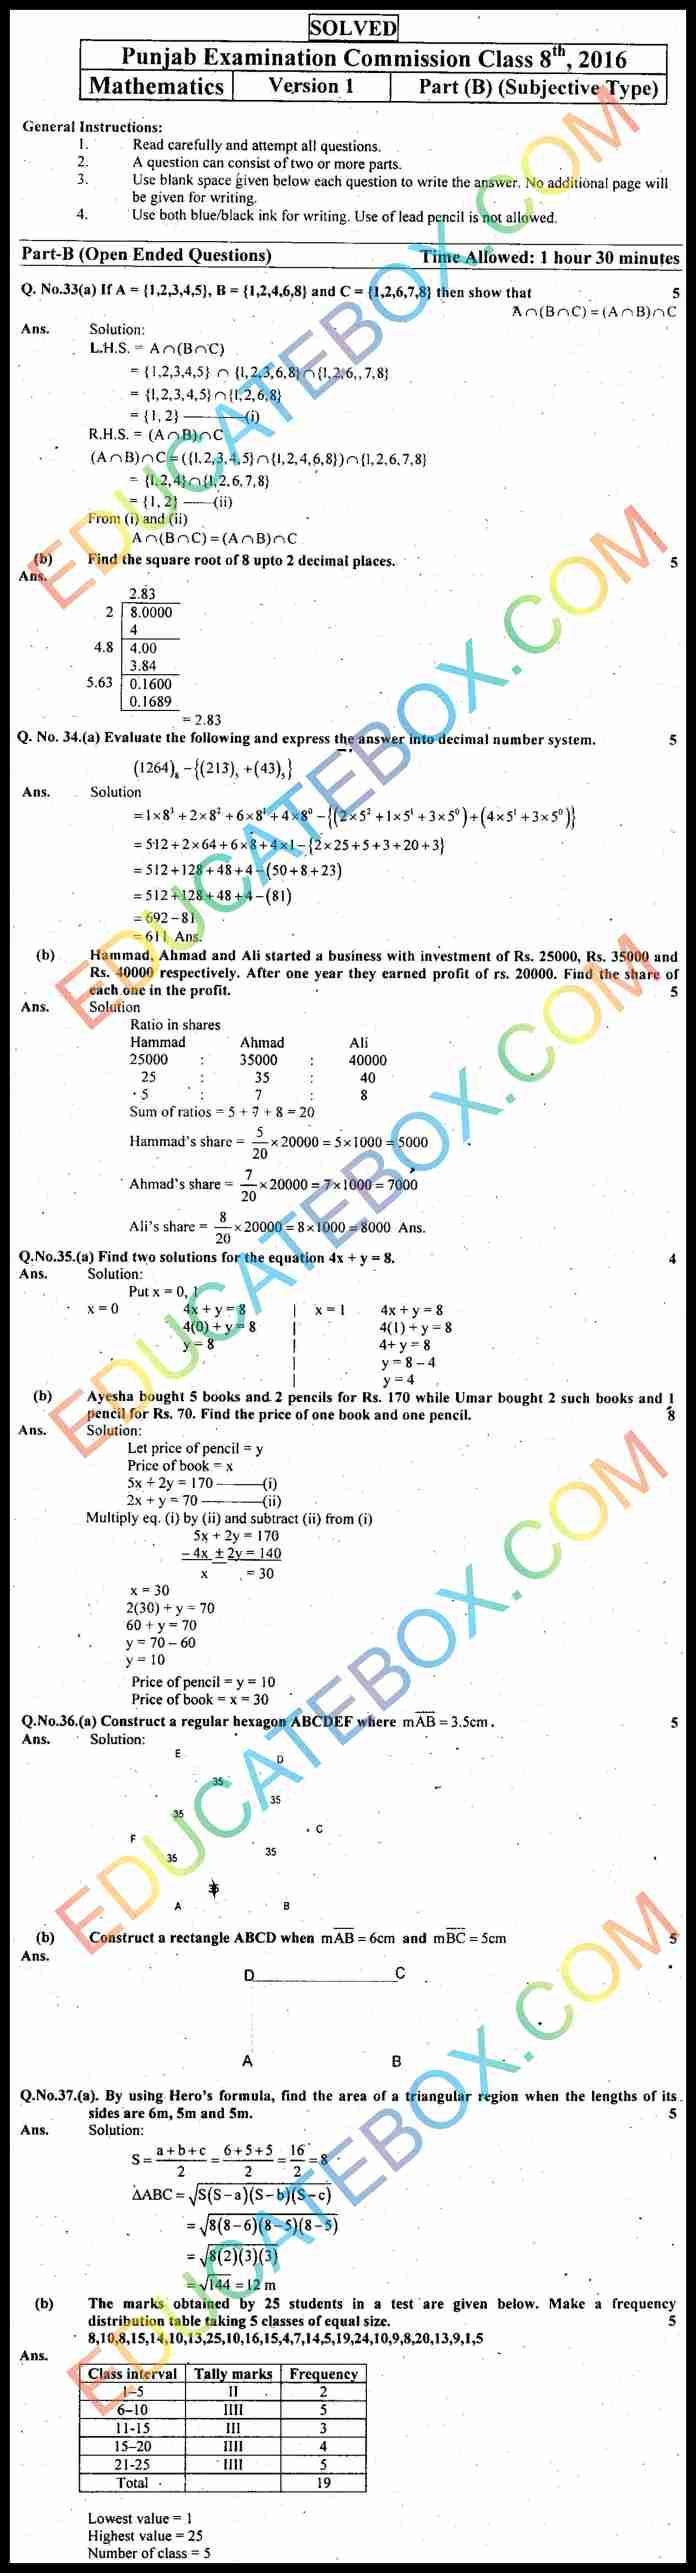 Past Paper 8th Class Maths 2016 Solved Paper Punjab Board (PEC) Subjective Type English Medium Version 1 اپ ٹو ڈیٹ پیپرایٹت کلاس میتھ سولڈ پیپر پنجاب بورڈ اوبجیکٹیو ٹائپ انگلش میڈیم ورژن 1